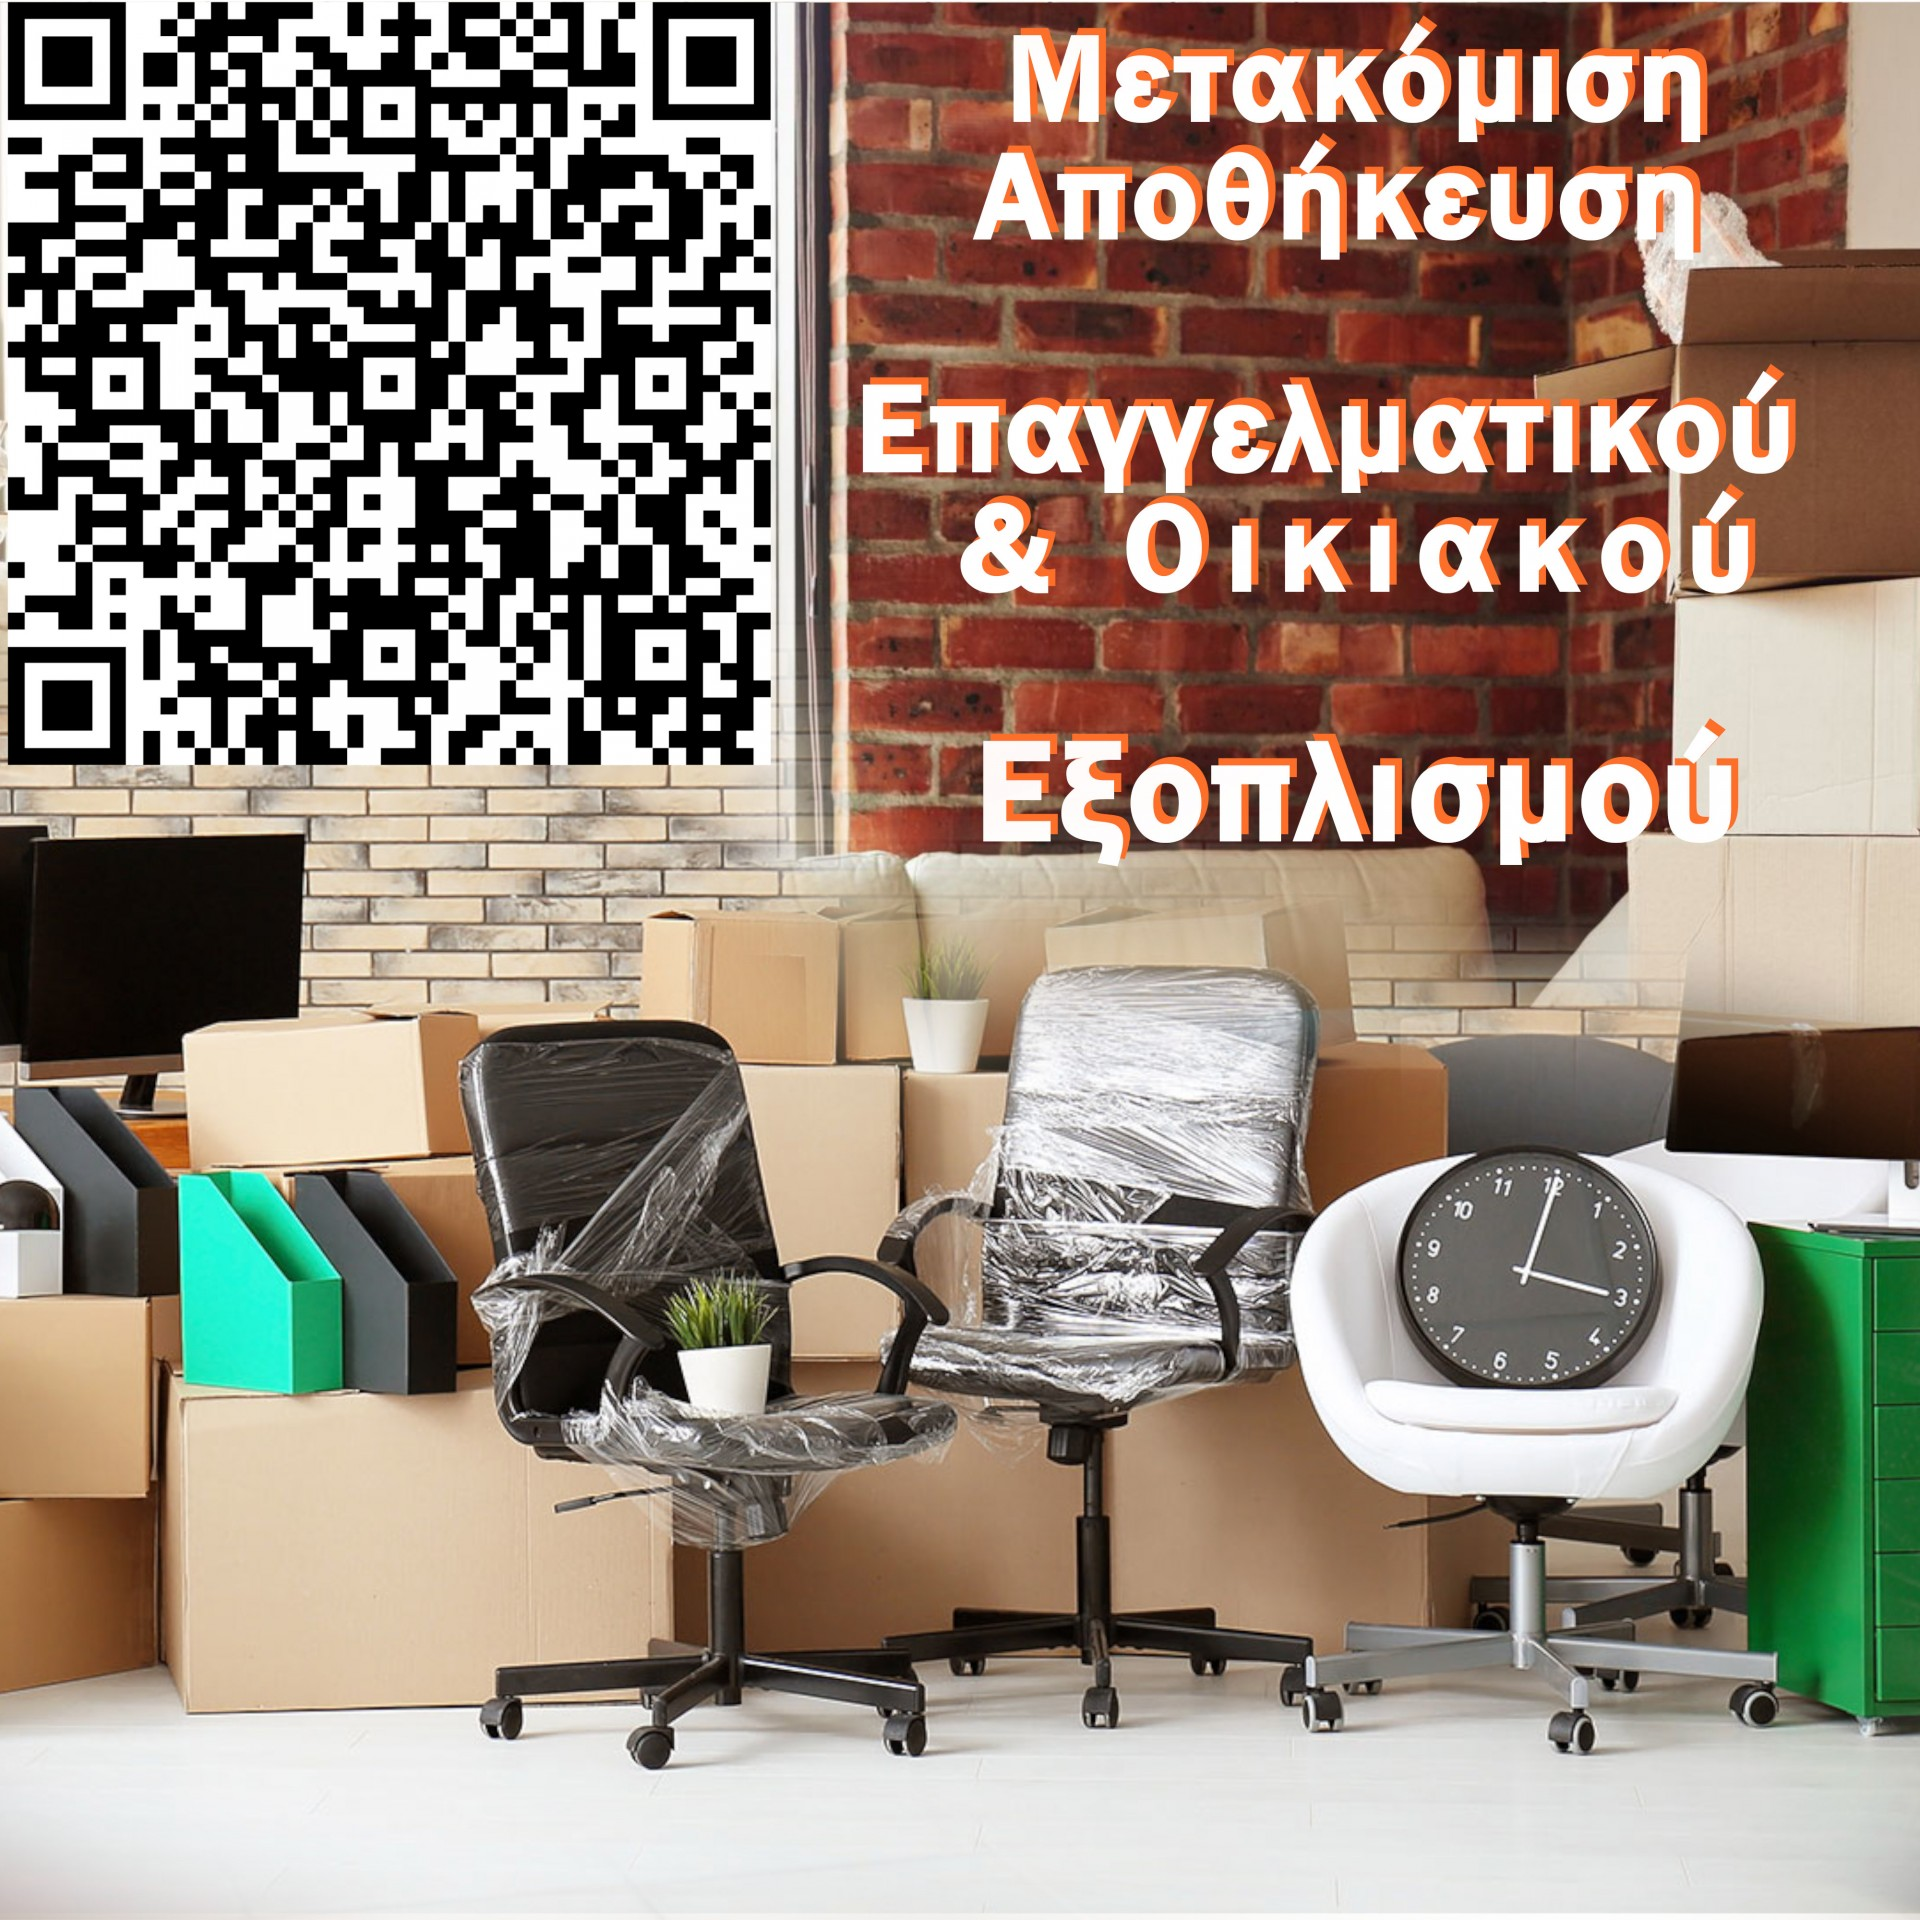 QR_Code_Form_(GR)